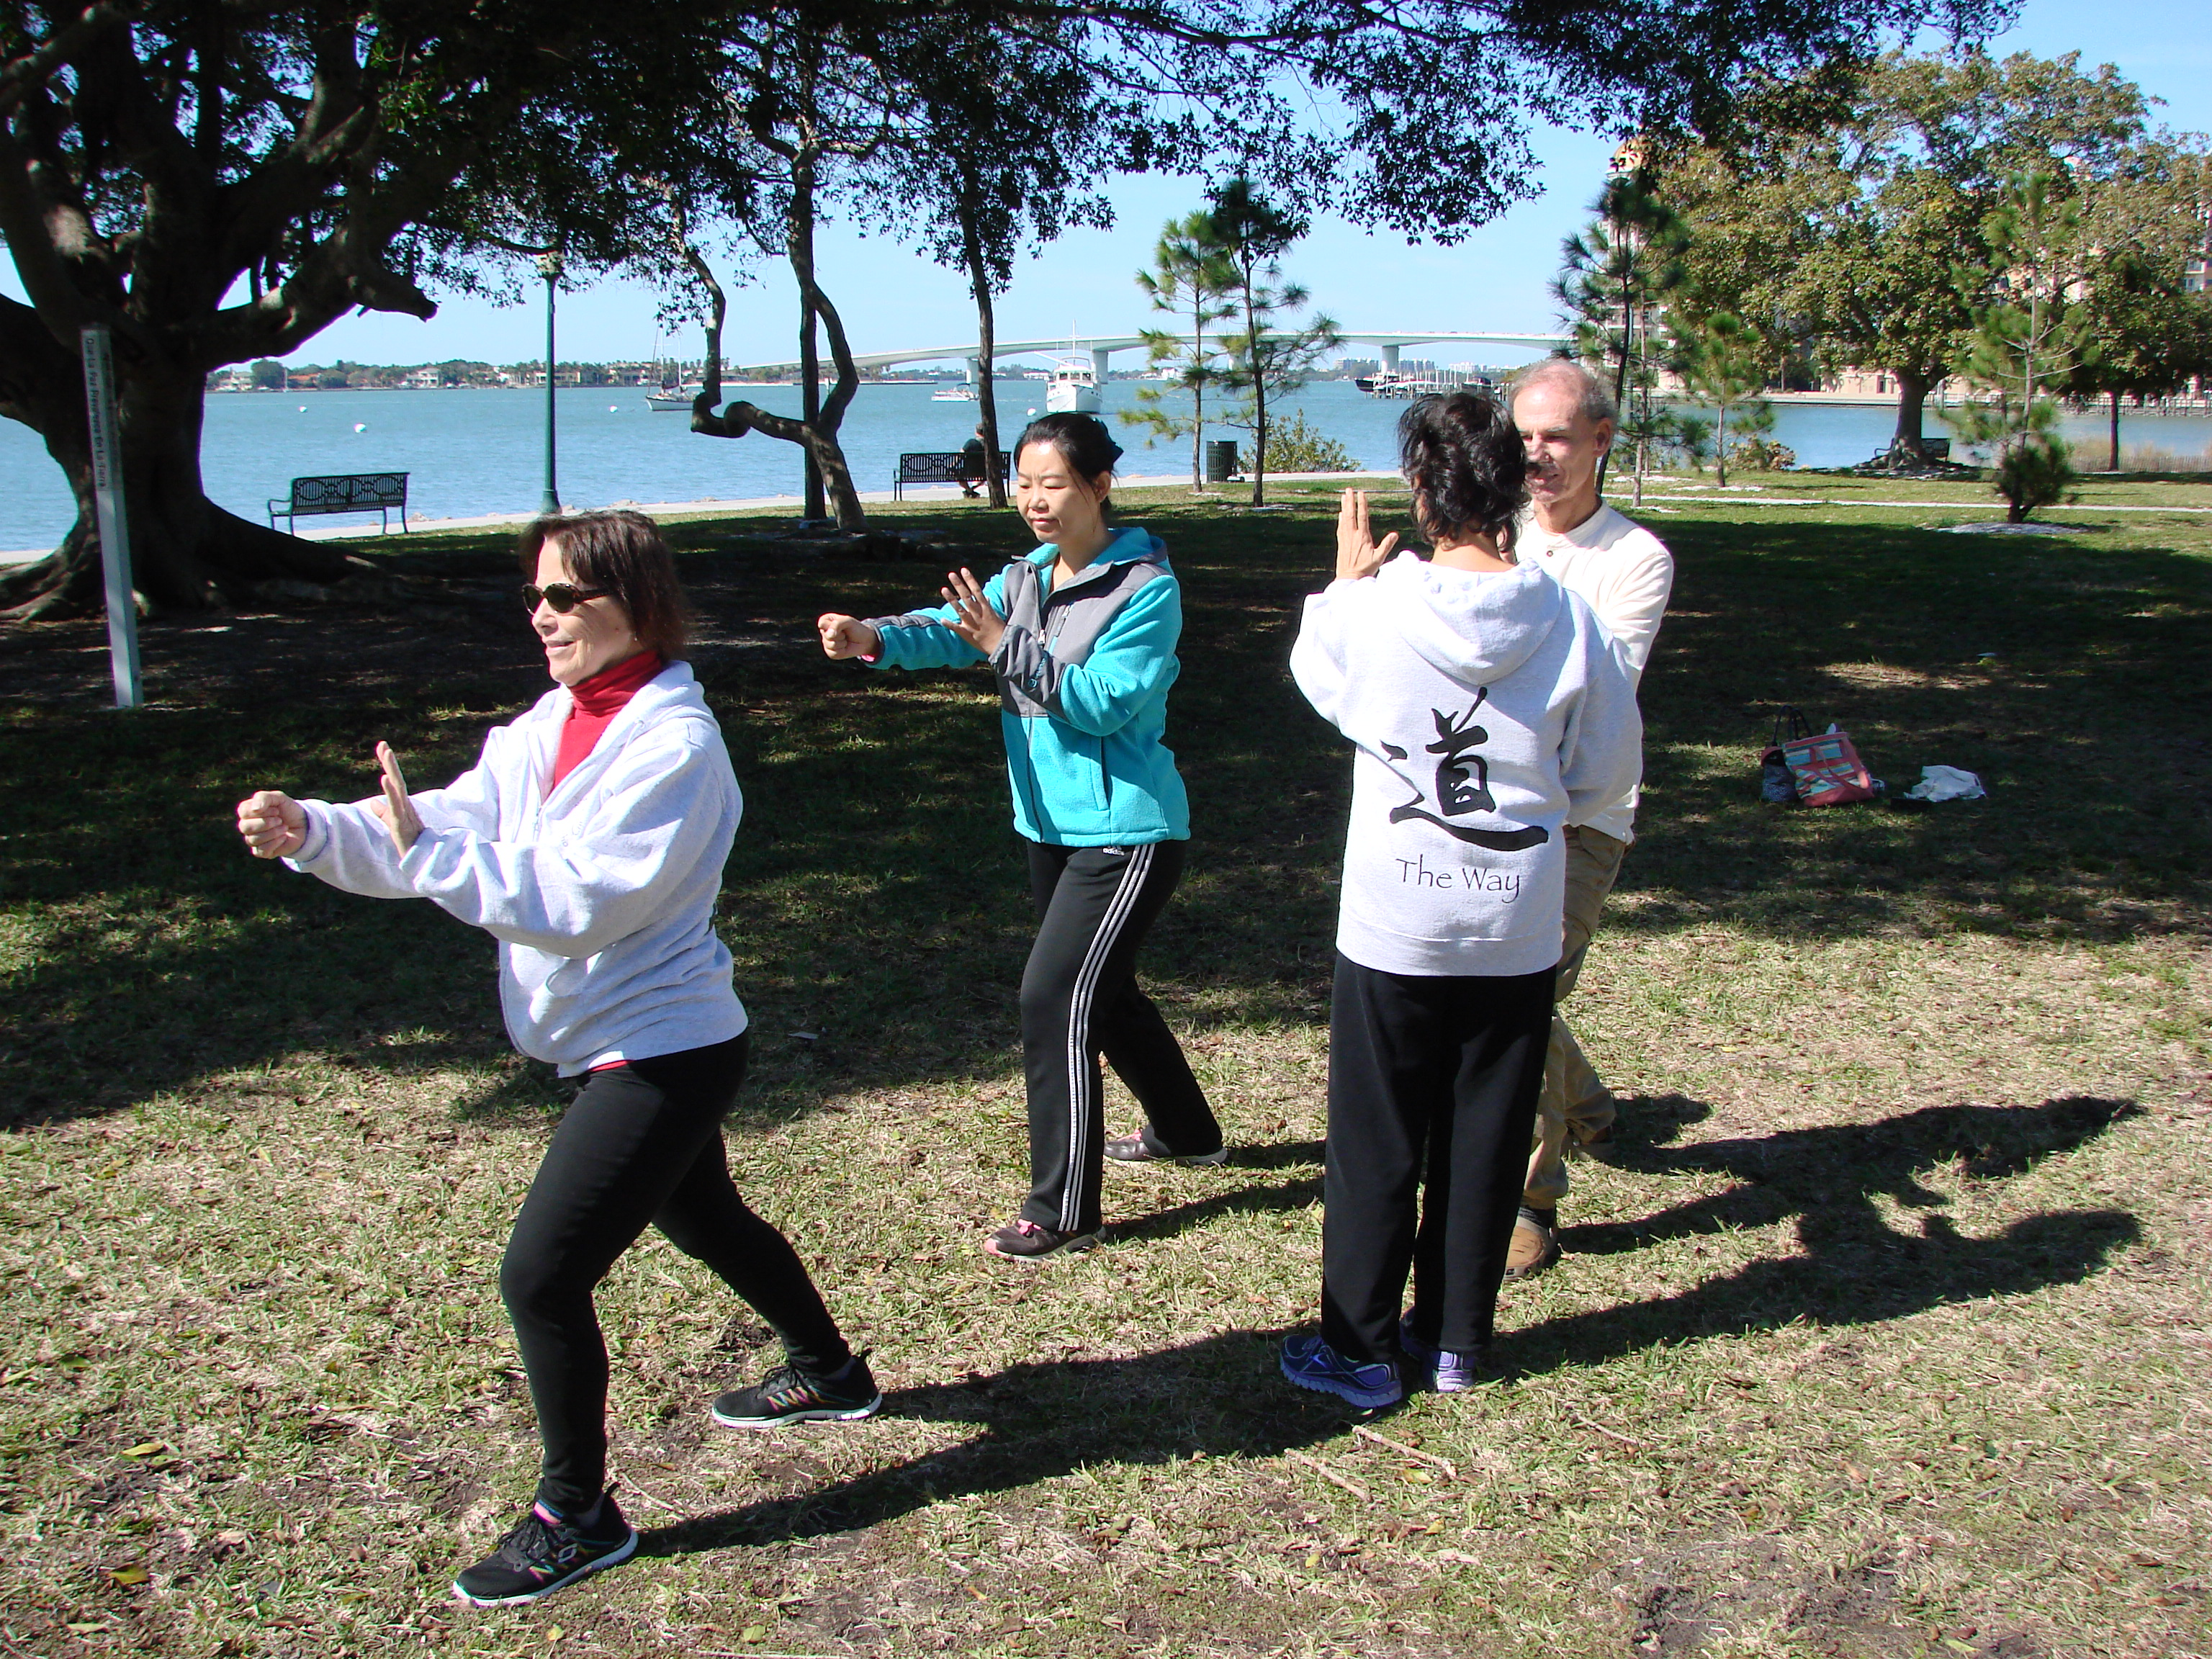 Feb14th 2016 Bay Front Park Sarasota FL